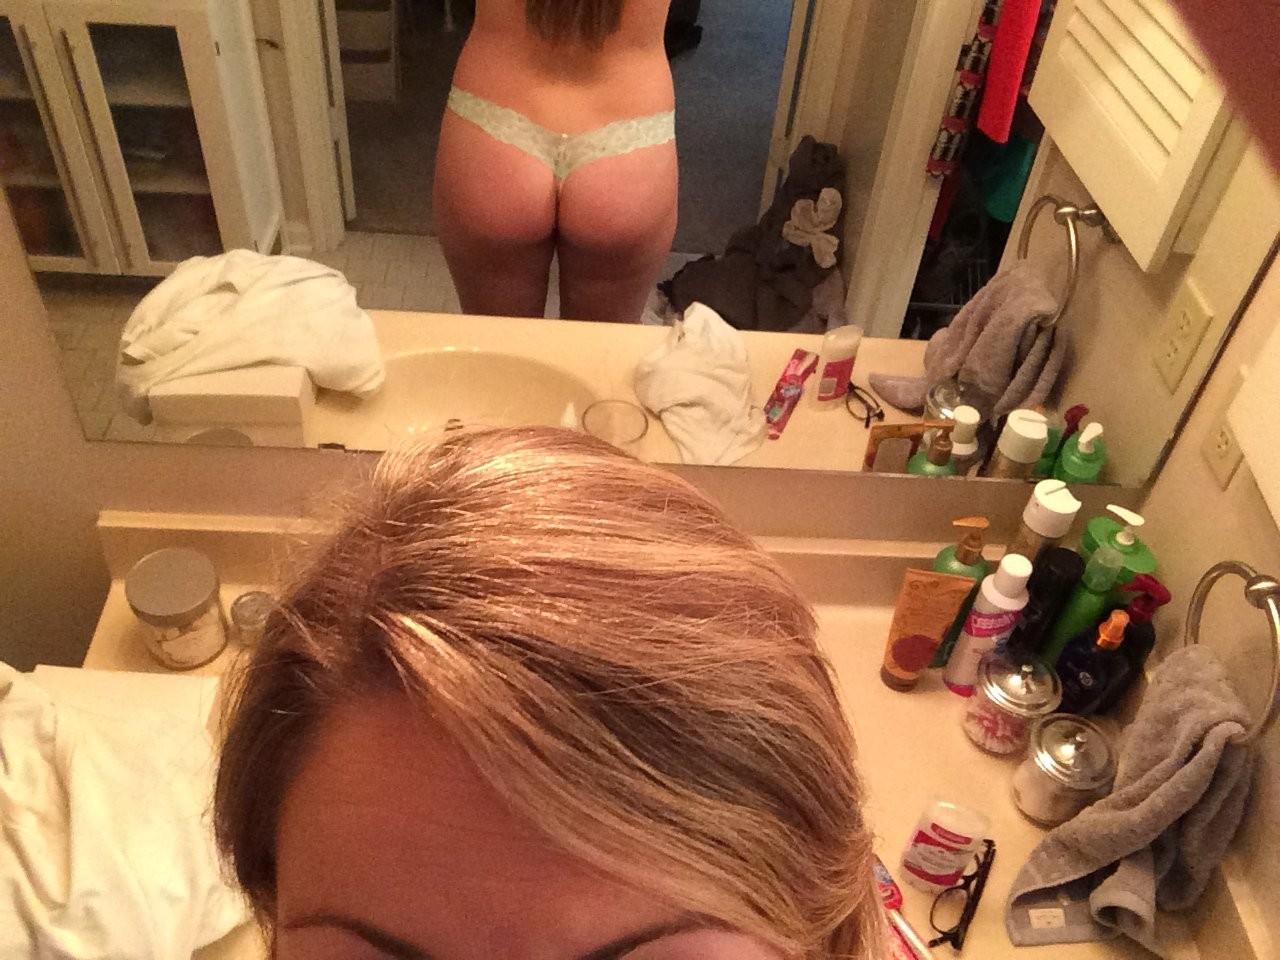 Nicola Peltz Nude Photos Leaked The Fappening